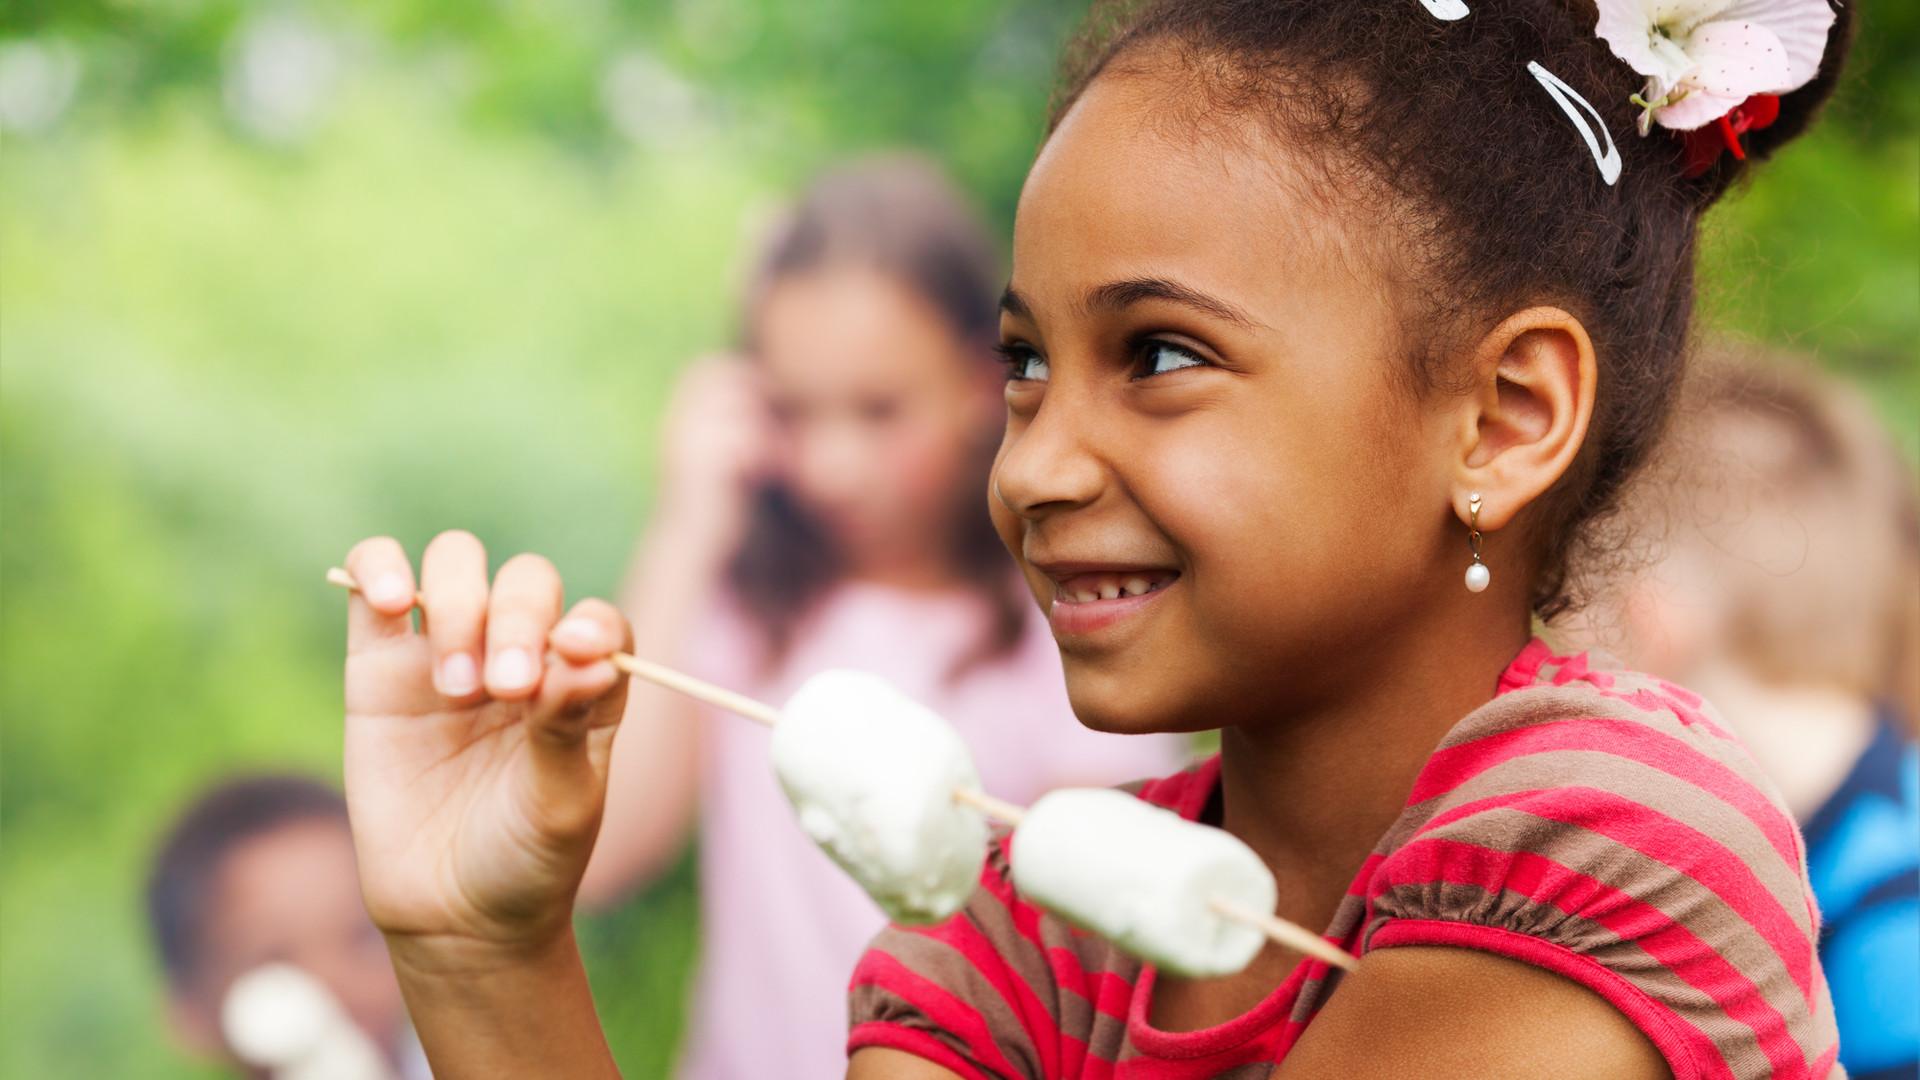 Girl Eating Marshmallows